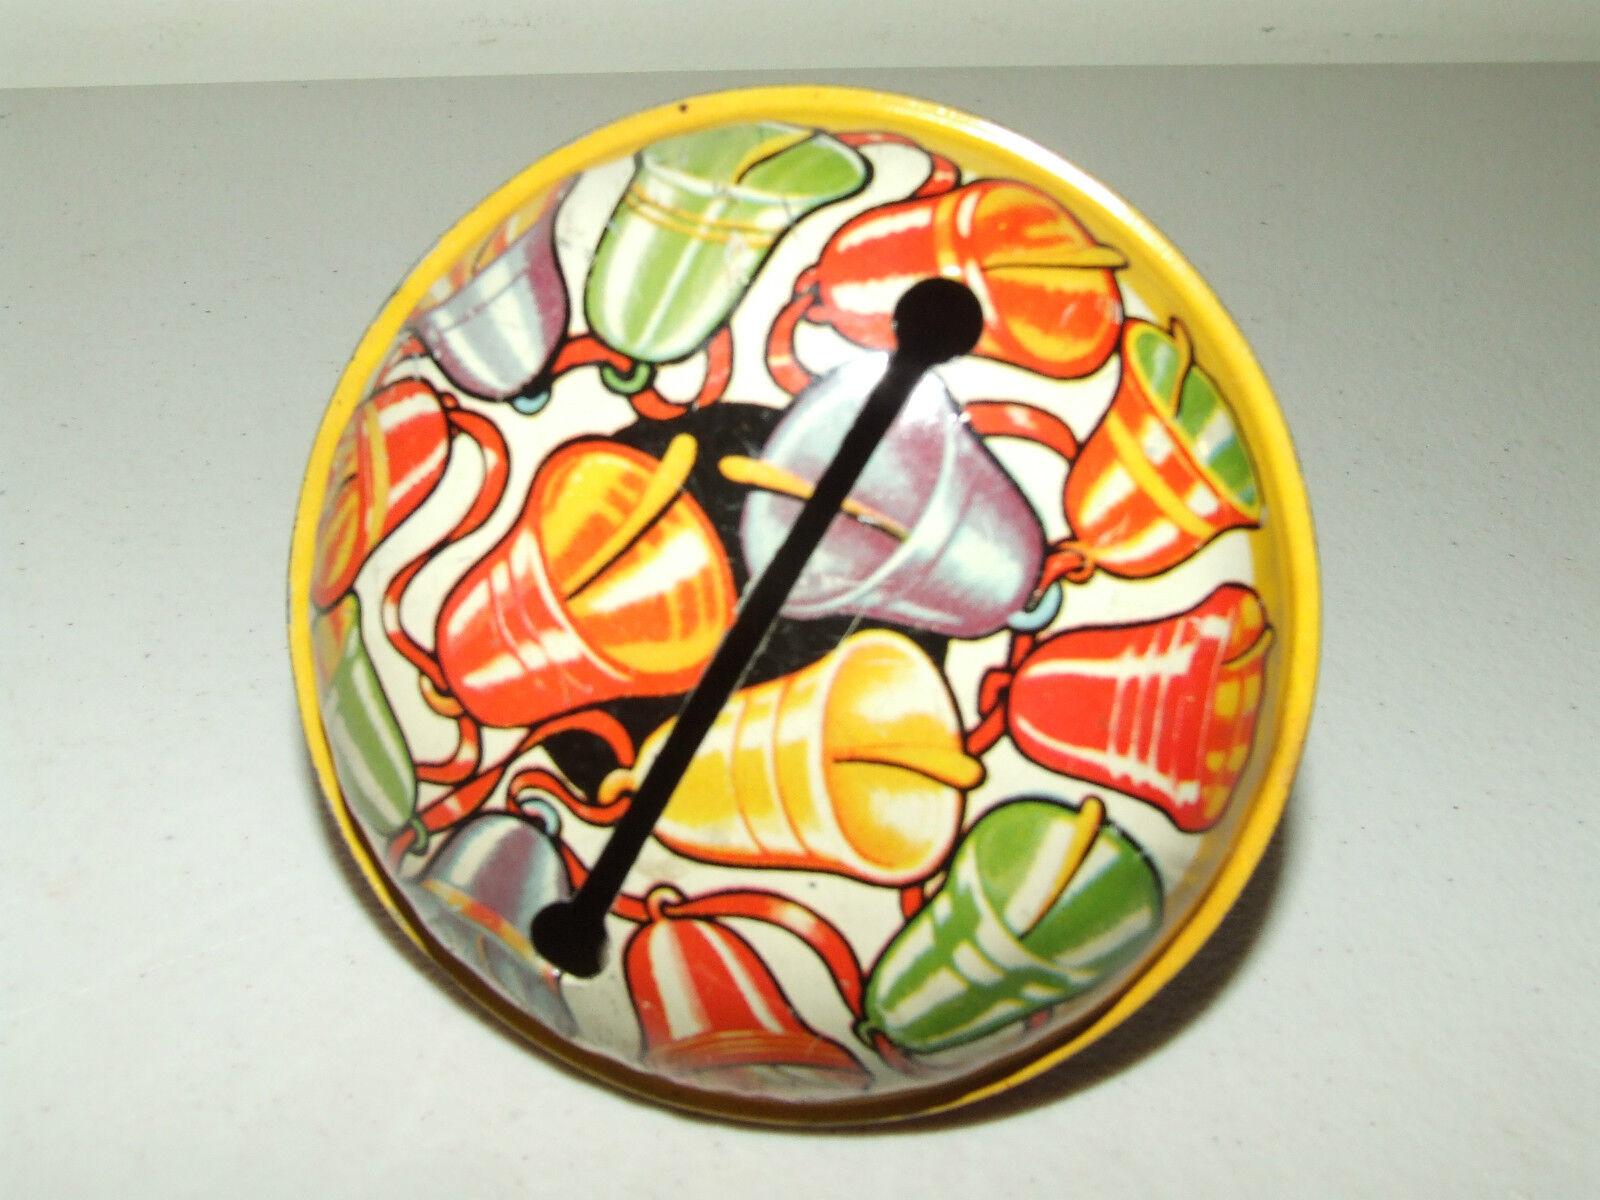 Vintage Vintage Vintage 1950's Tin Litho Noise Maker Lot - Kirchhof Co. Newark NJ Made in USA 79dcb6